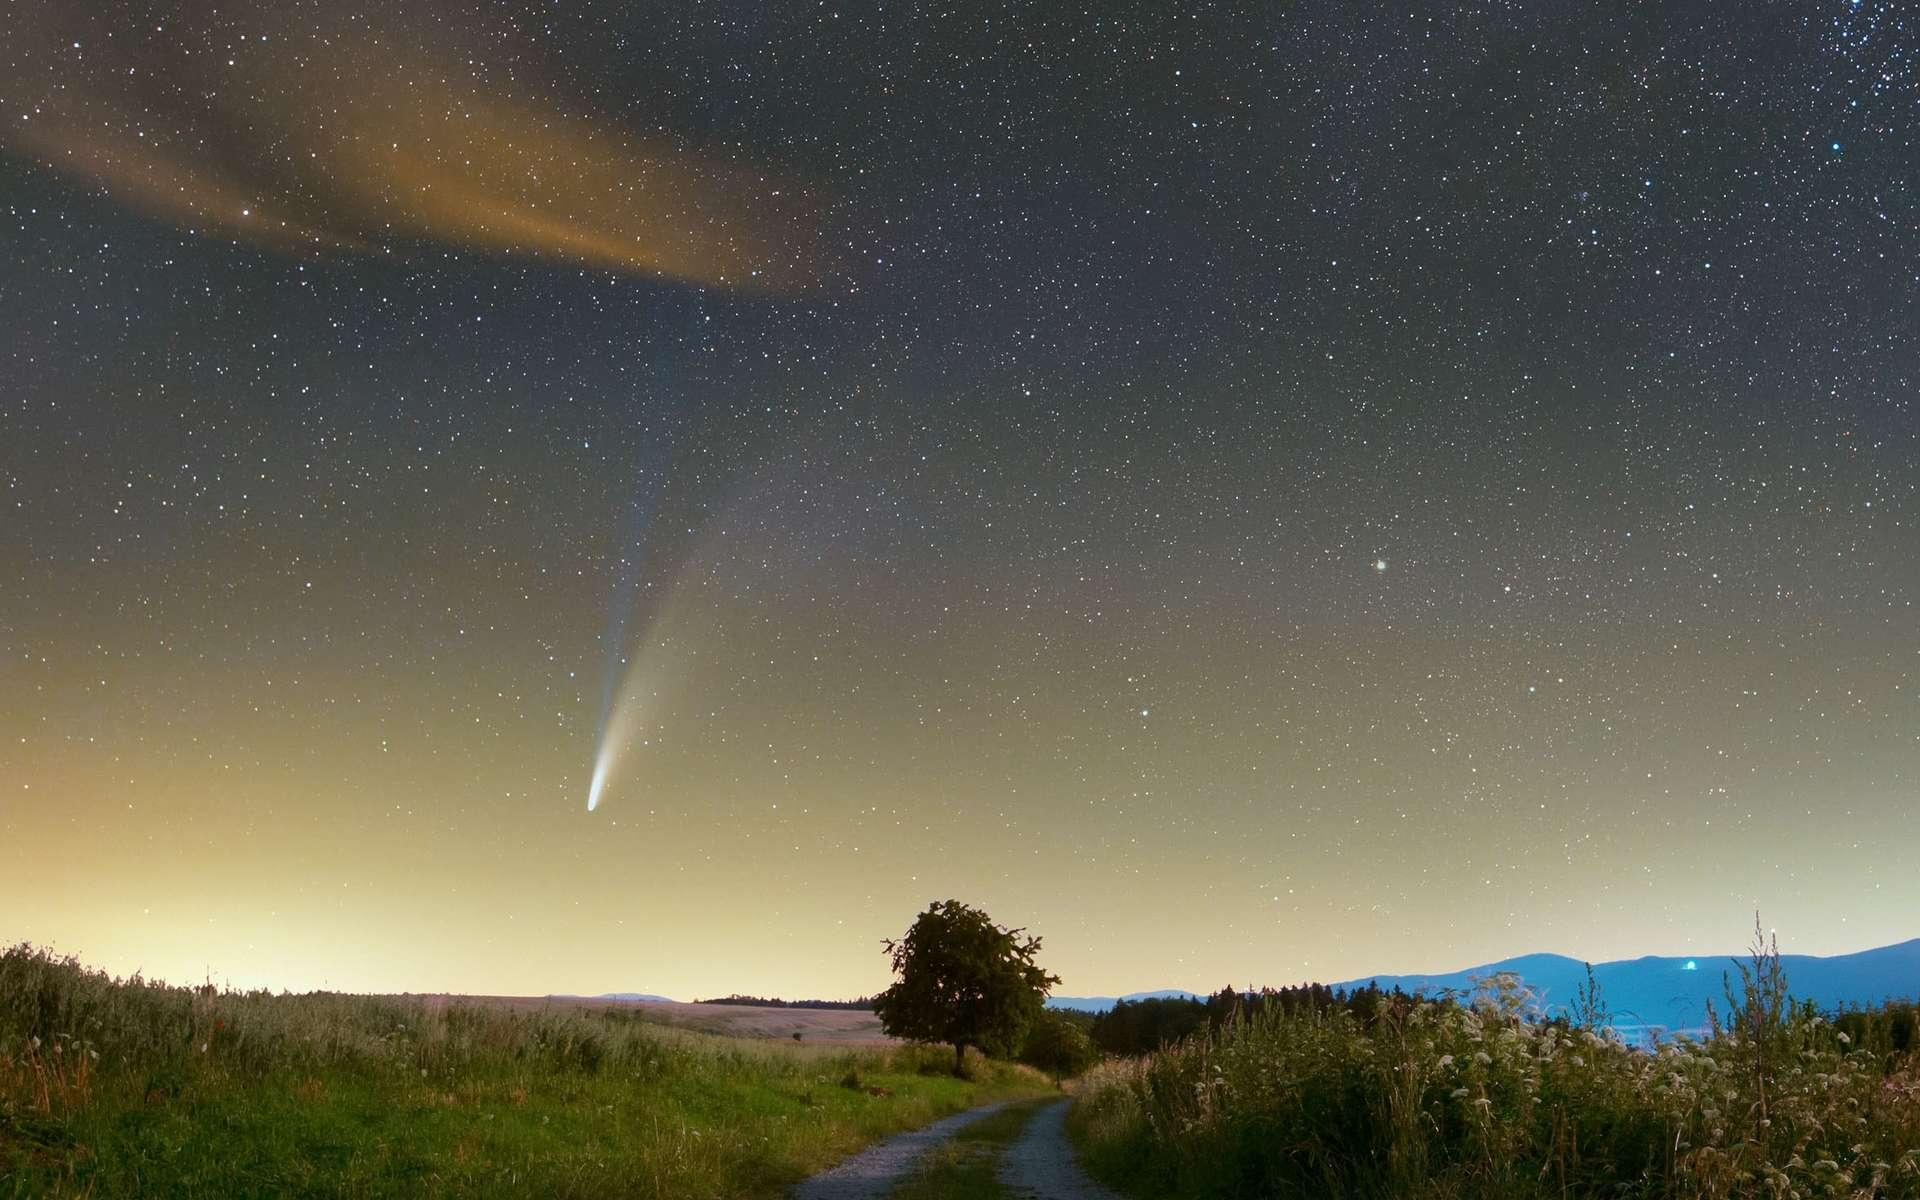 La comète à longue période C/2020 F3 (Neowise), photographiée en Pologne. © Jarek Oszywa, Apod, Nasa